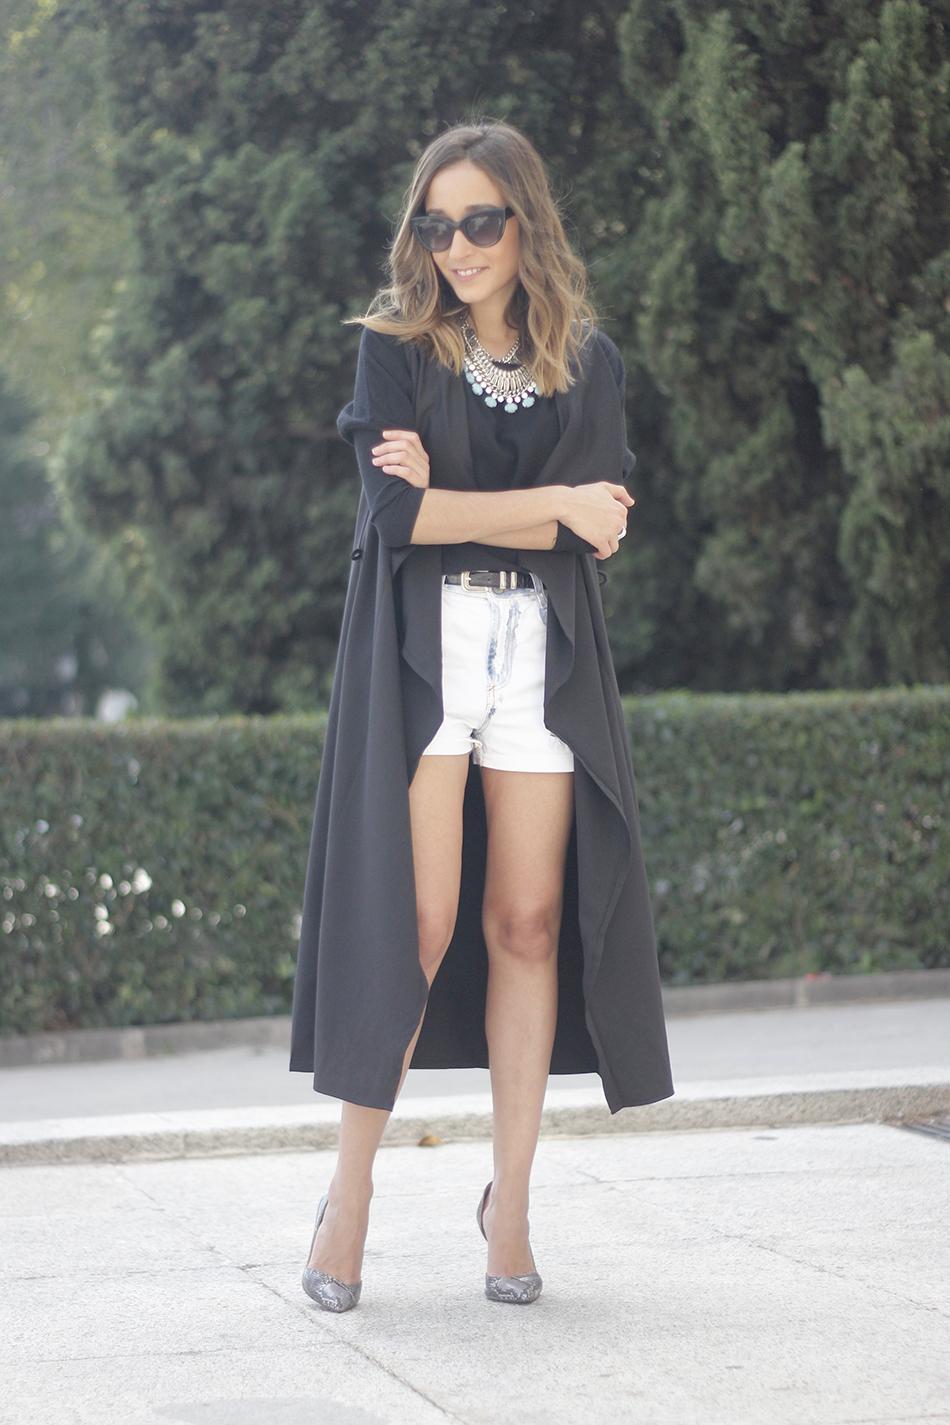 Black Vest Sheinside Shorts Outfit23